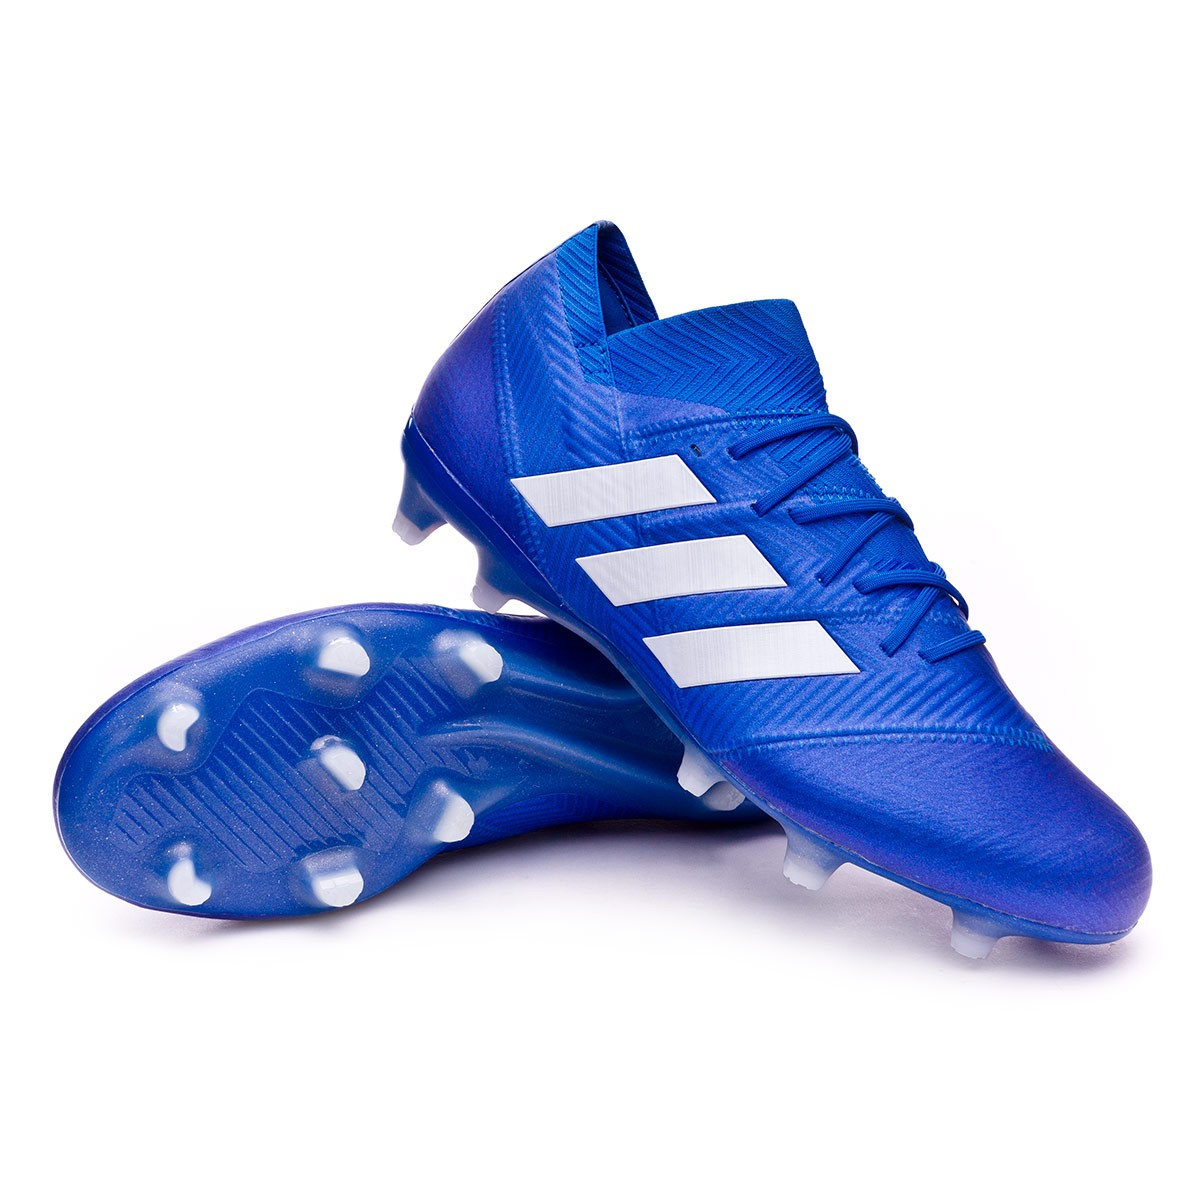 be8871c7956 Football Boots adidas Nemeziz 18.1 FG Football blue-White - Tienda ...